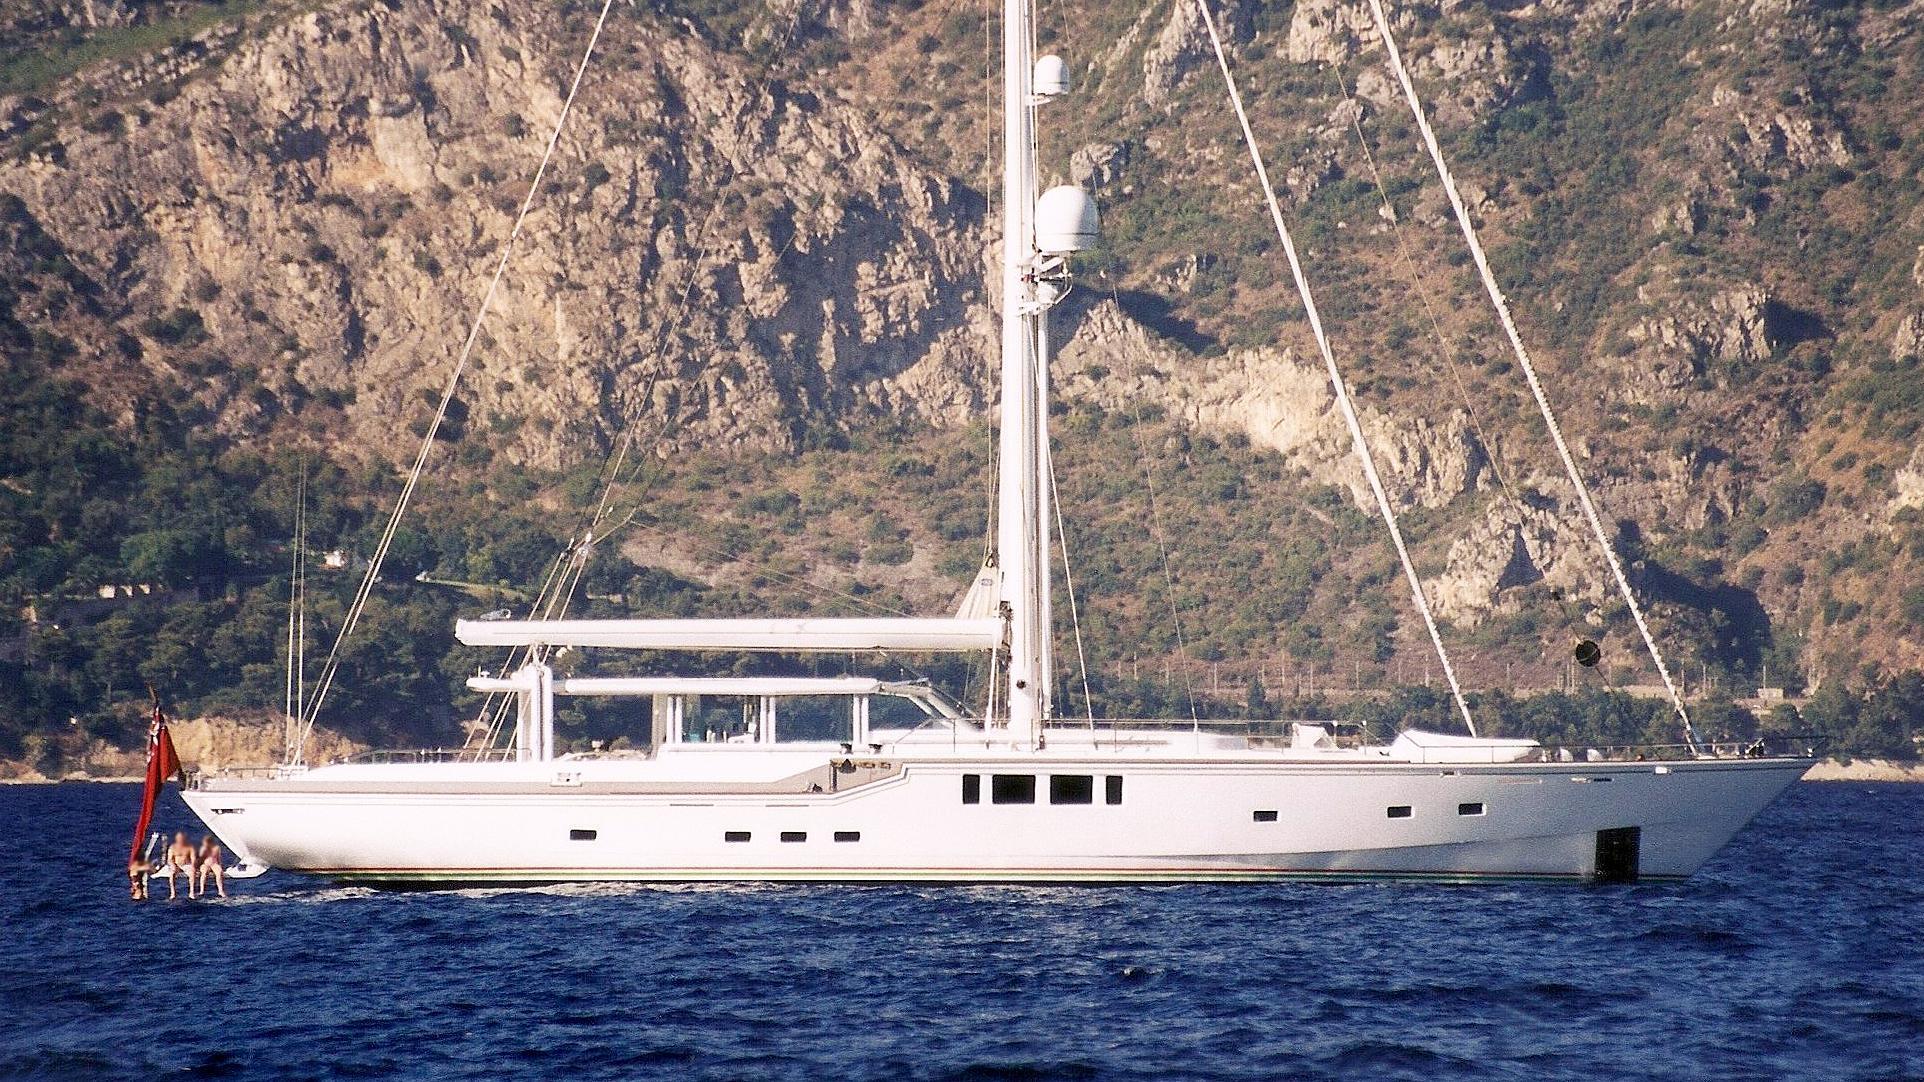 diamond-for-ever-sailing-yacht-oryal-huisman-1987-36m-profile